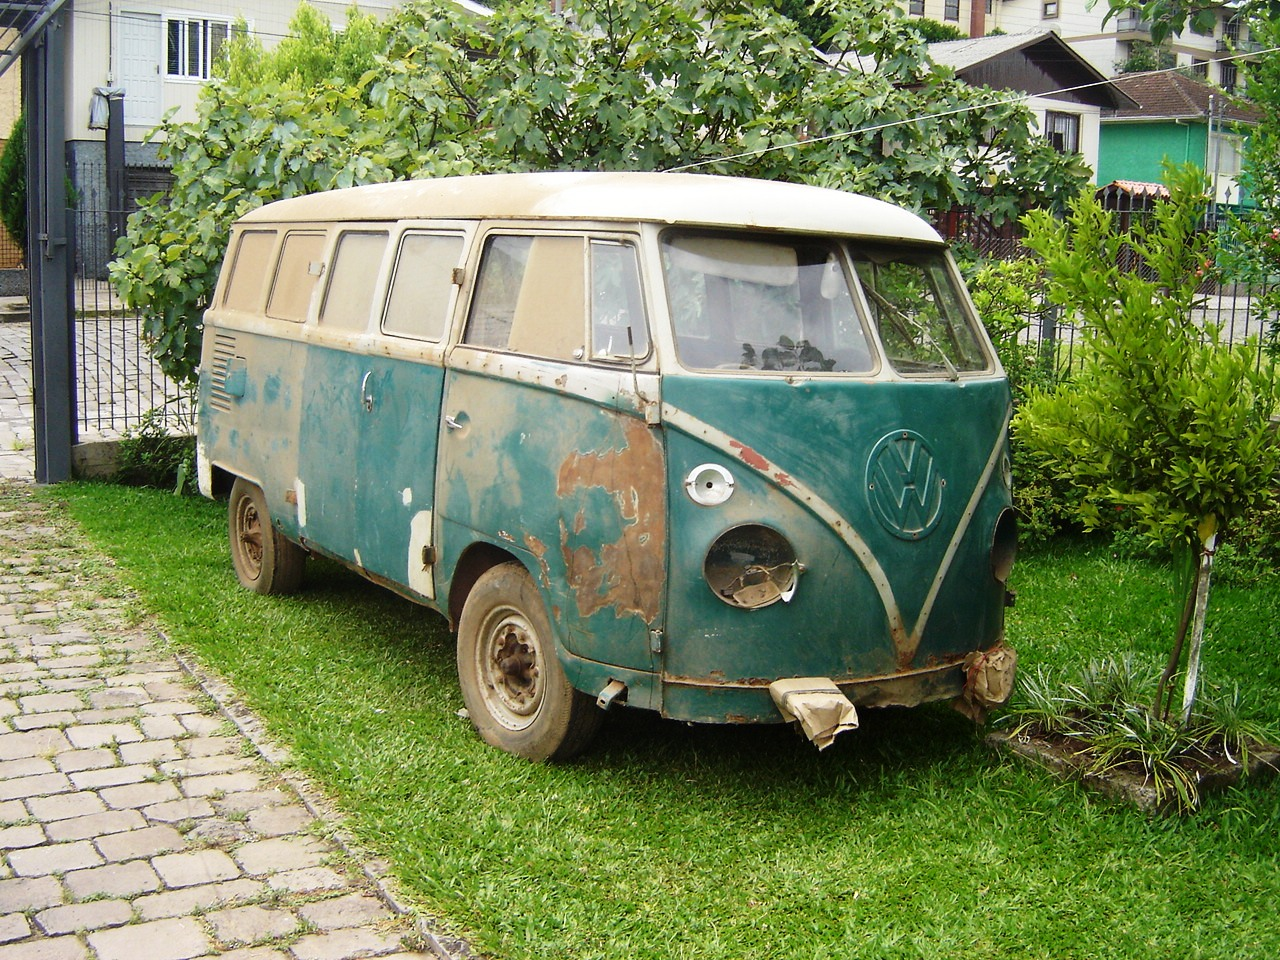 uedio-pasinatto-kombi-caxias-do-sul1 Volkswagen Kombi